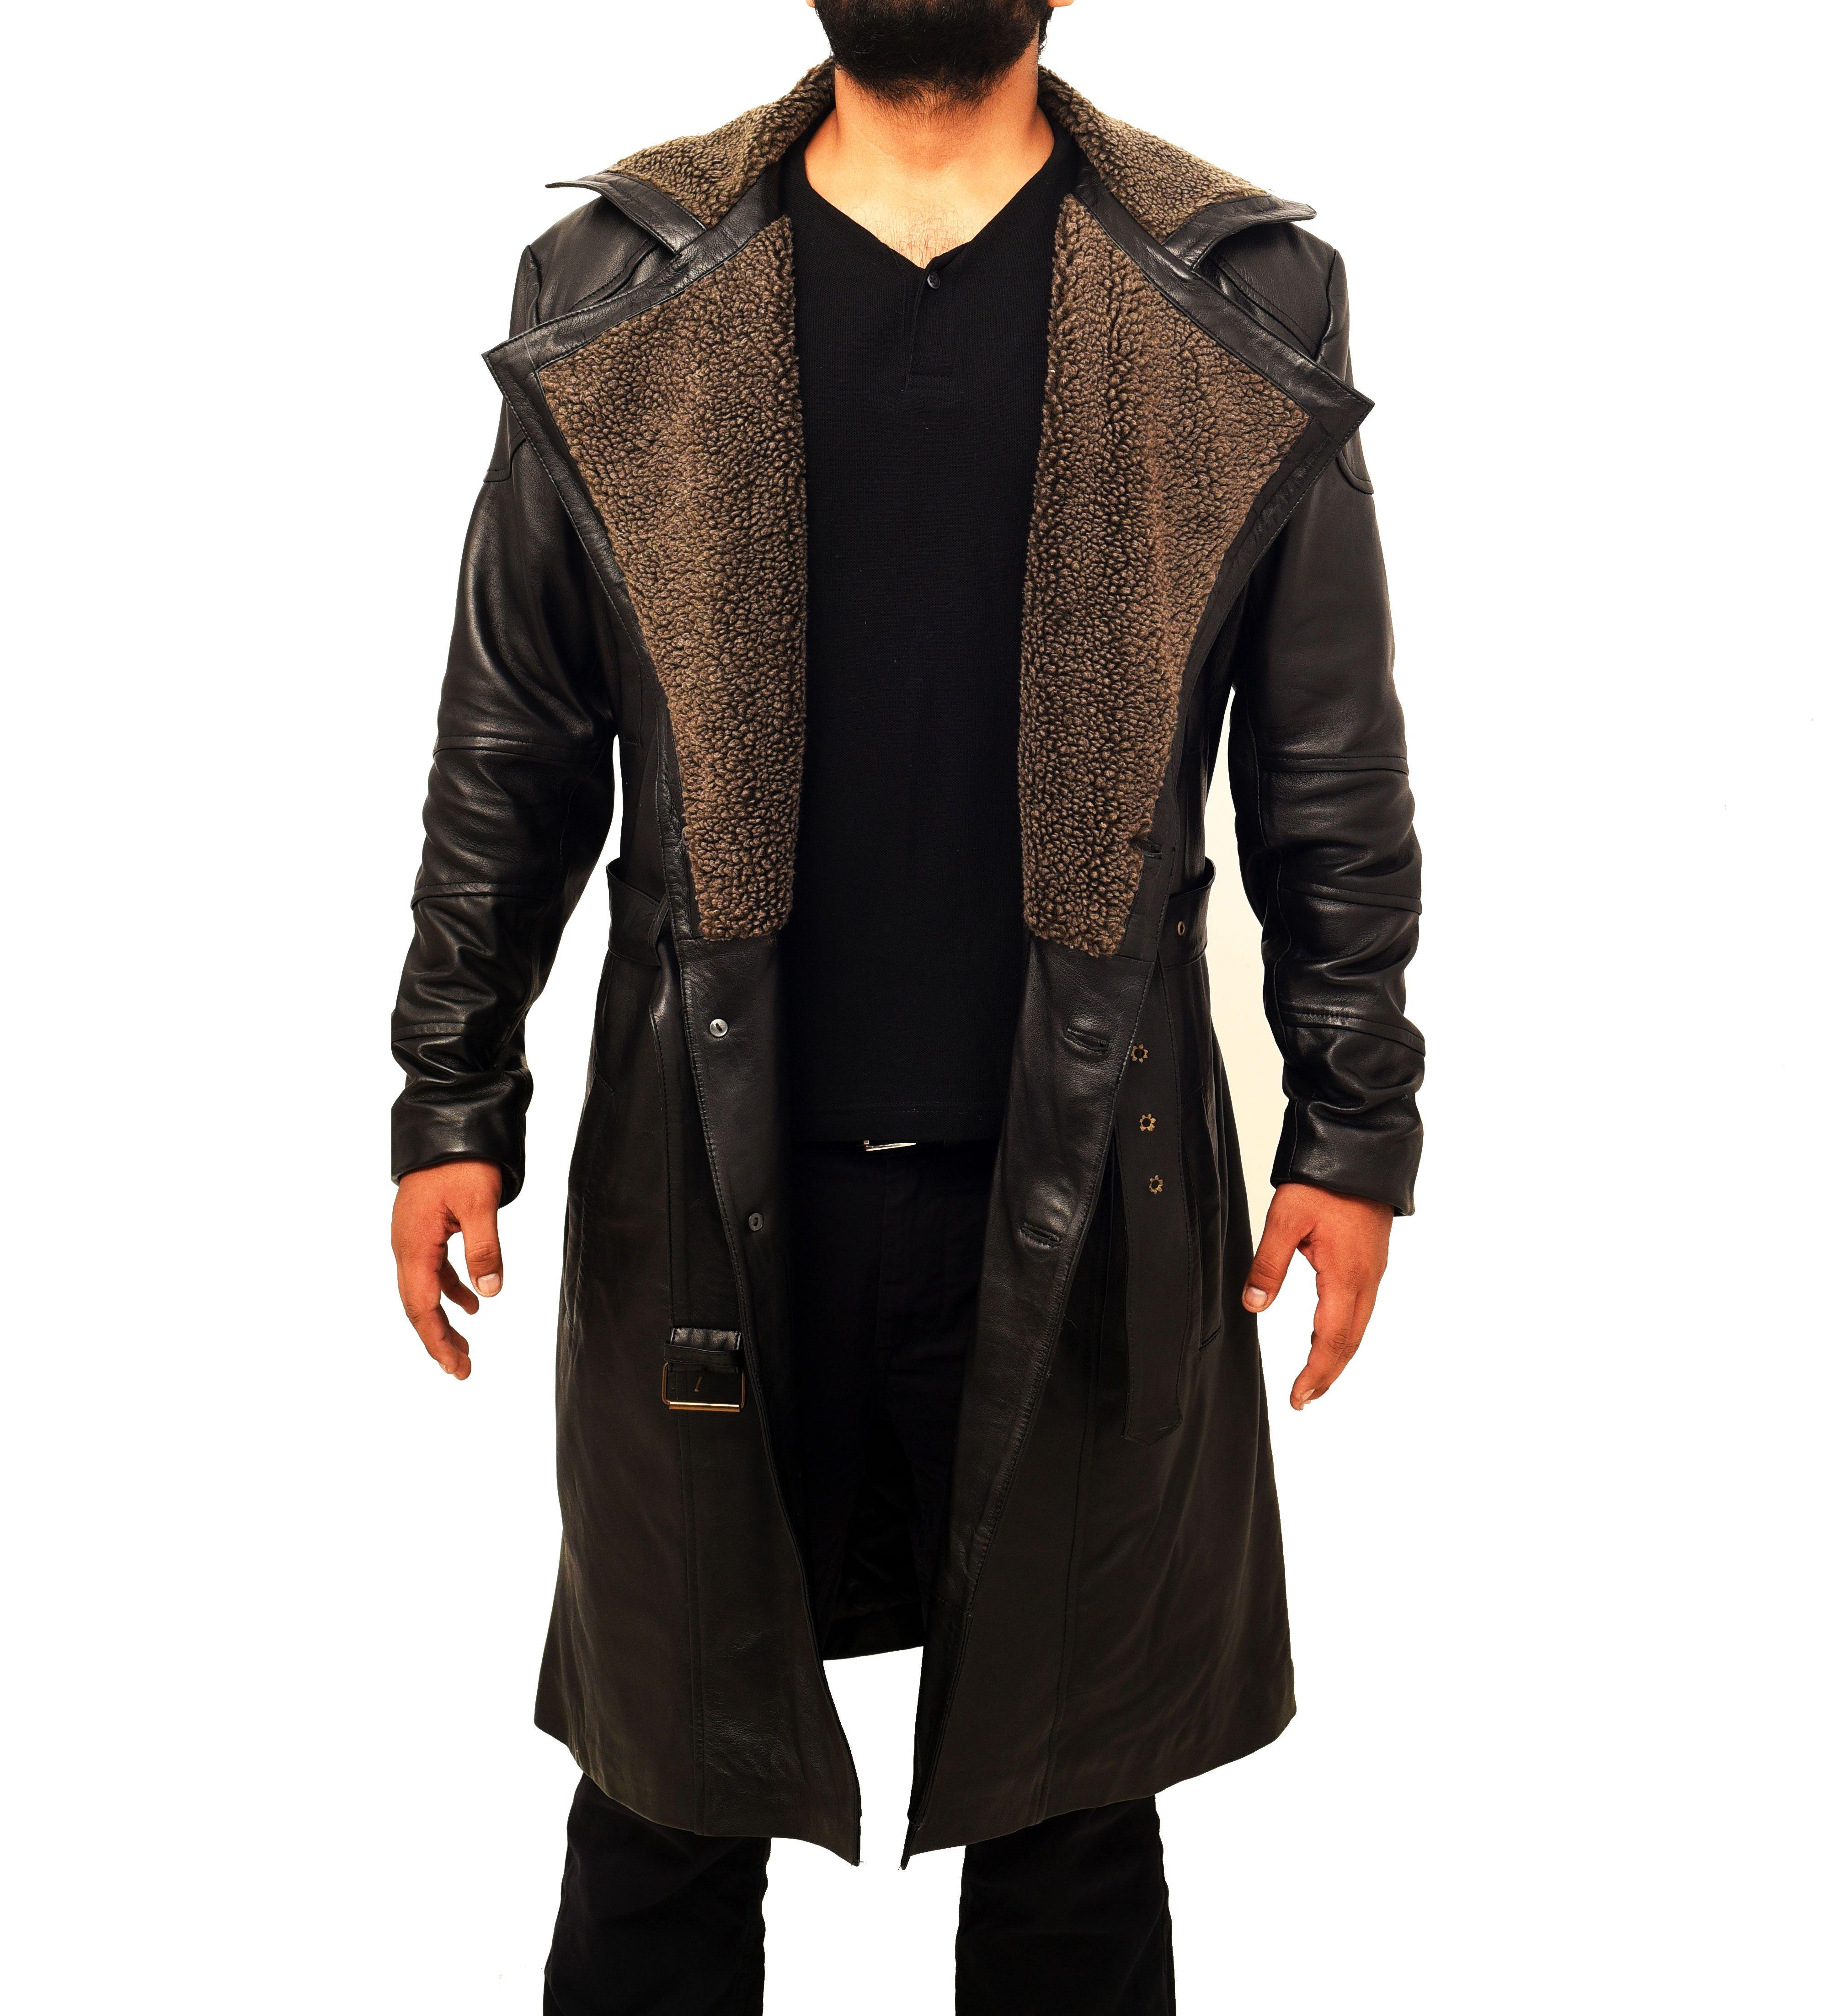 https://www.theleathercity.com/product/ryan-gosling-blade-runner-2049-coat/?gclid=CjwKCAiAoqXQBRA8EiwAIIOWsoebkHbgyW6x7Fs-zWcE3FiAyTqYYyJqRuIvxu4Uzsh5EIFRaEeoTxoC2fgQAvD_BwE#